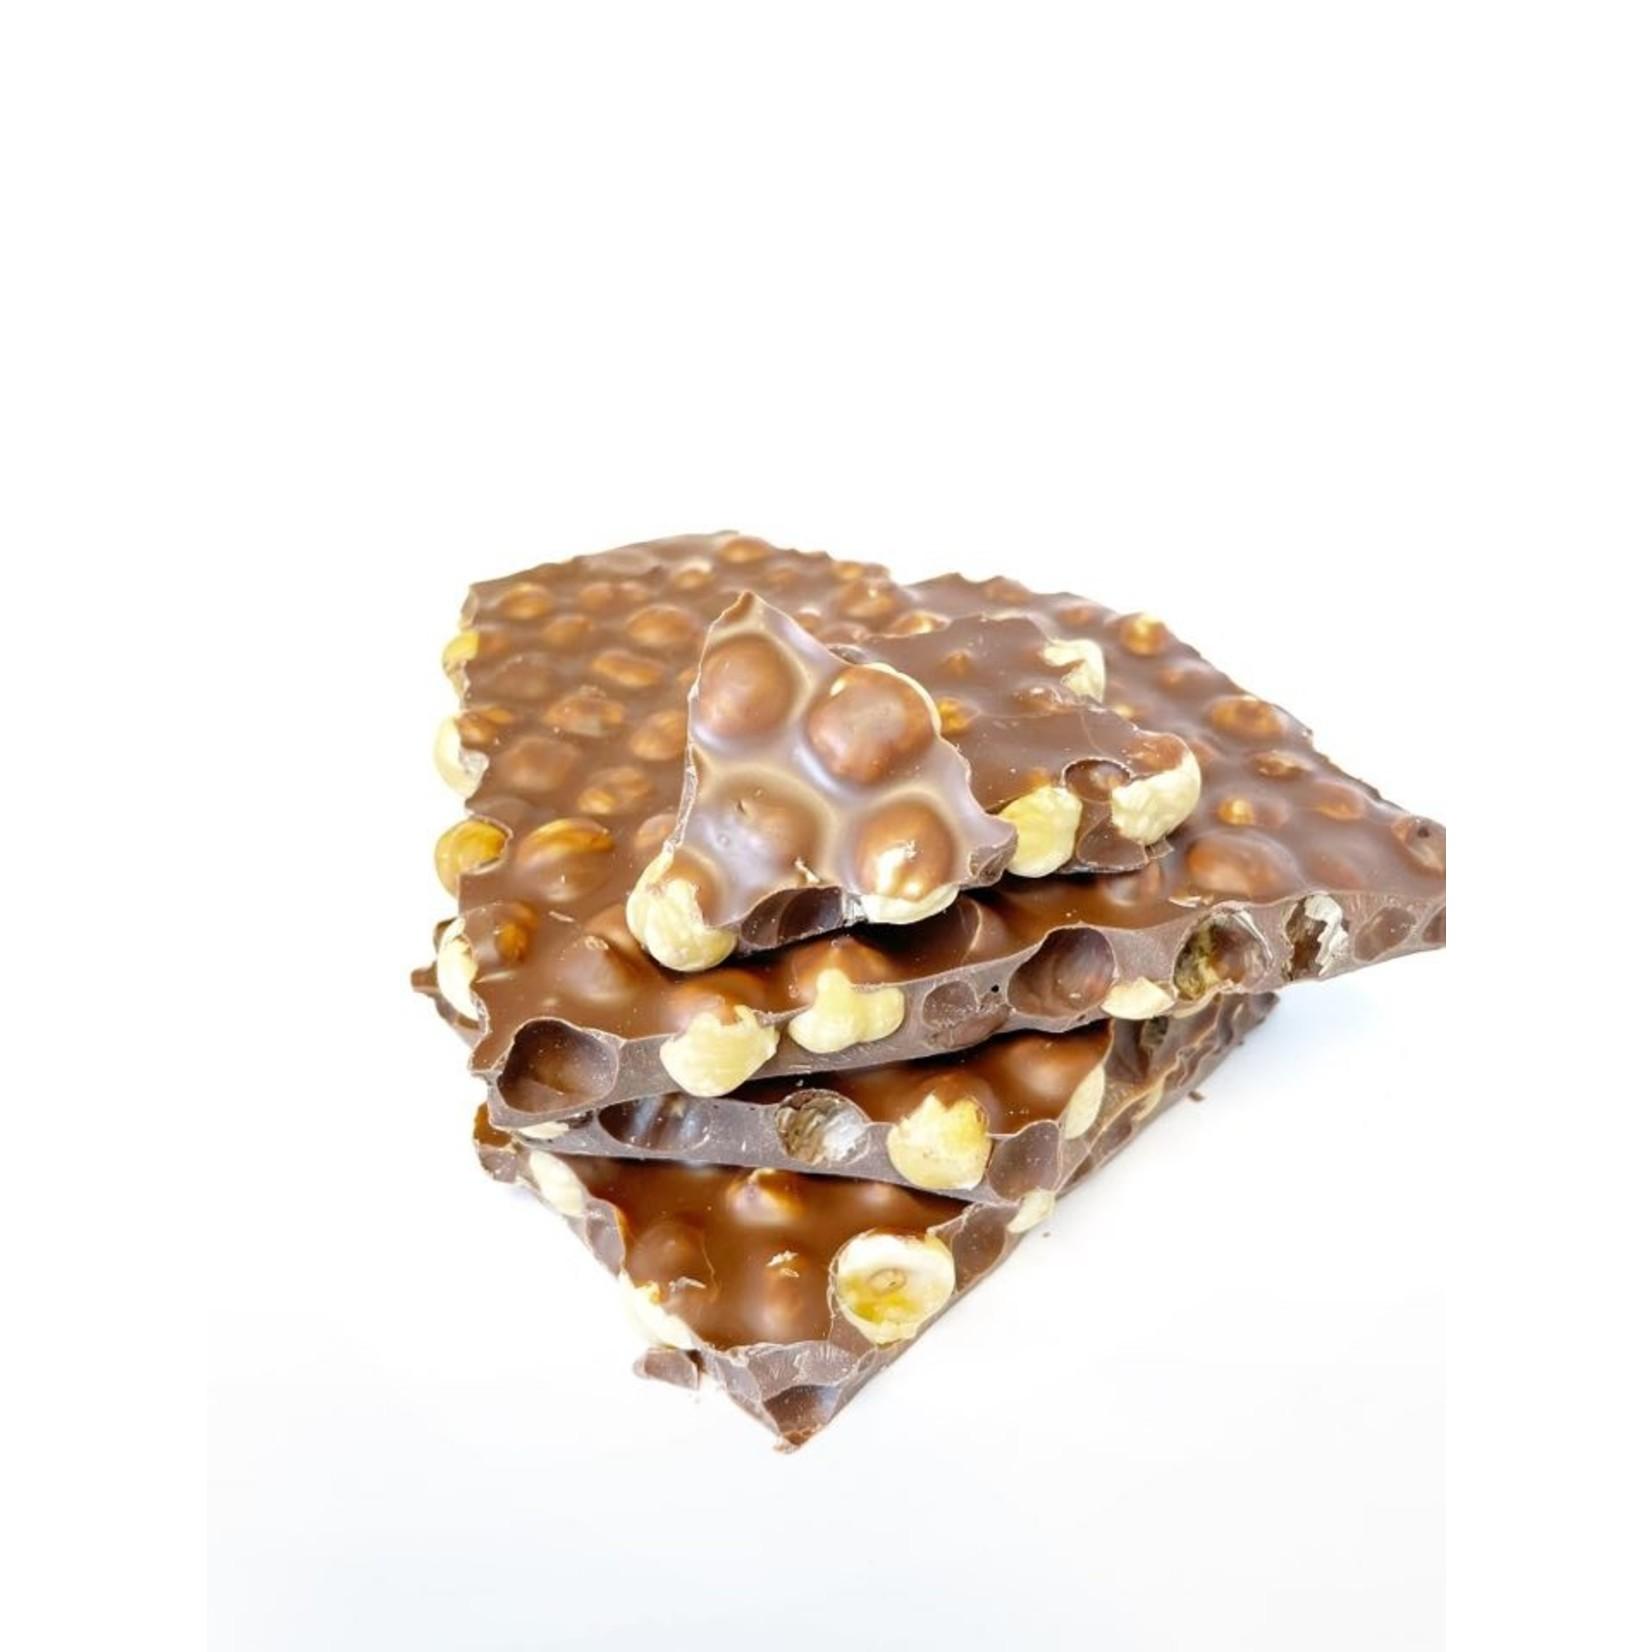 Blokchocolade Hazelnoot Melk 400g